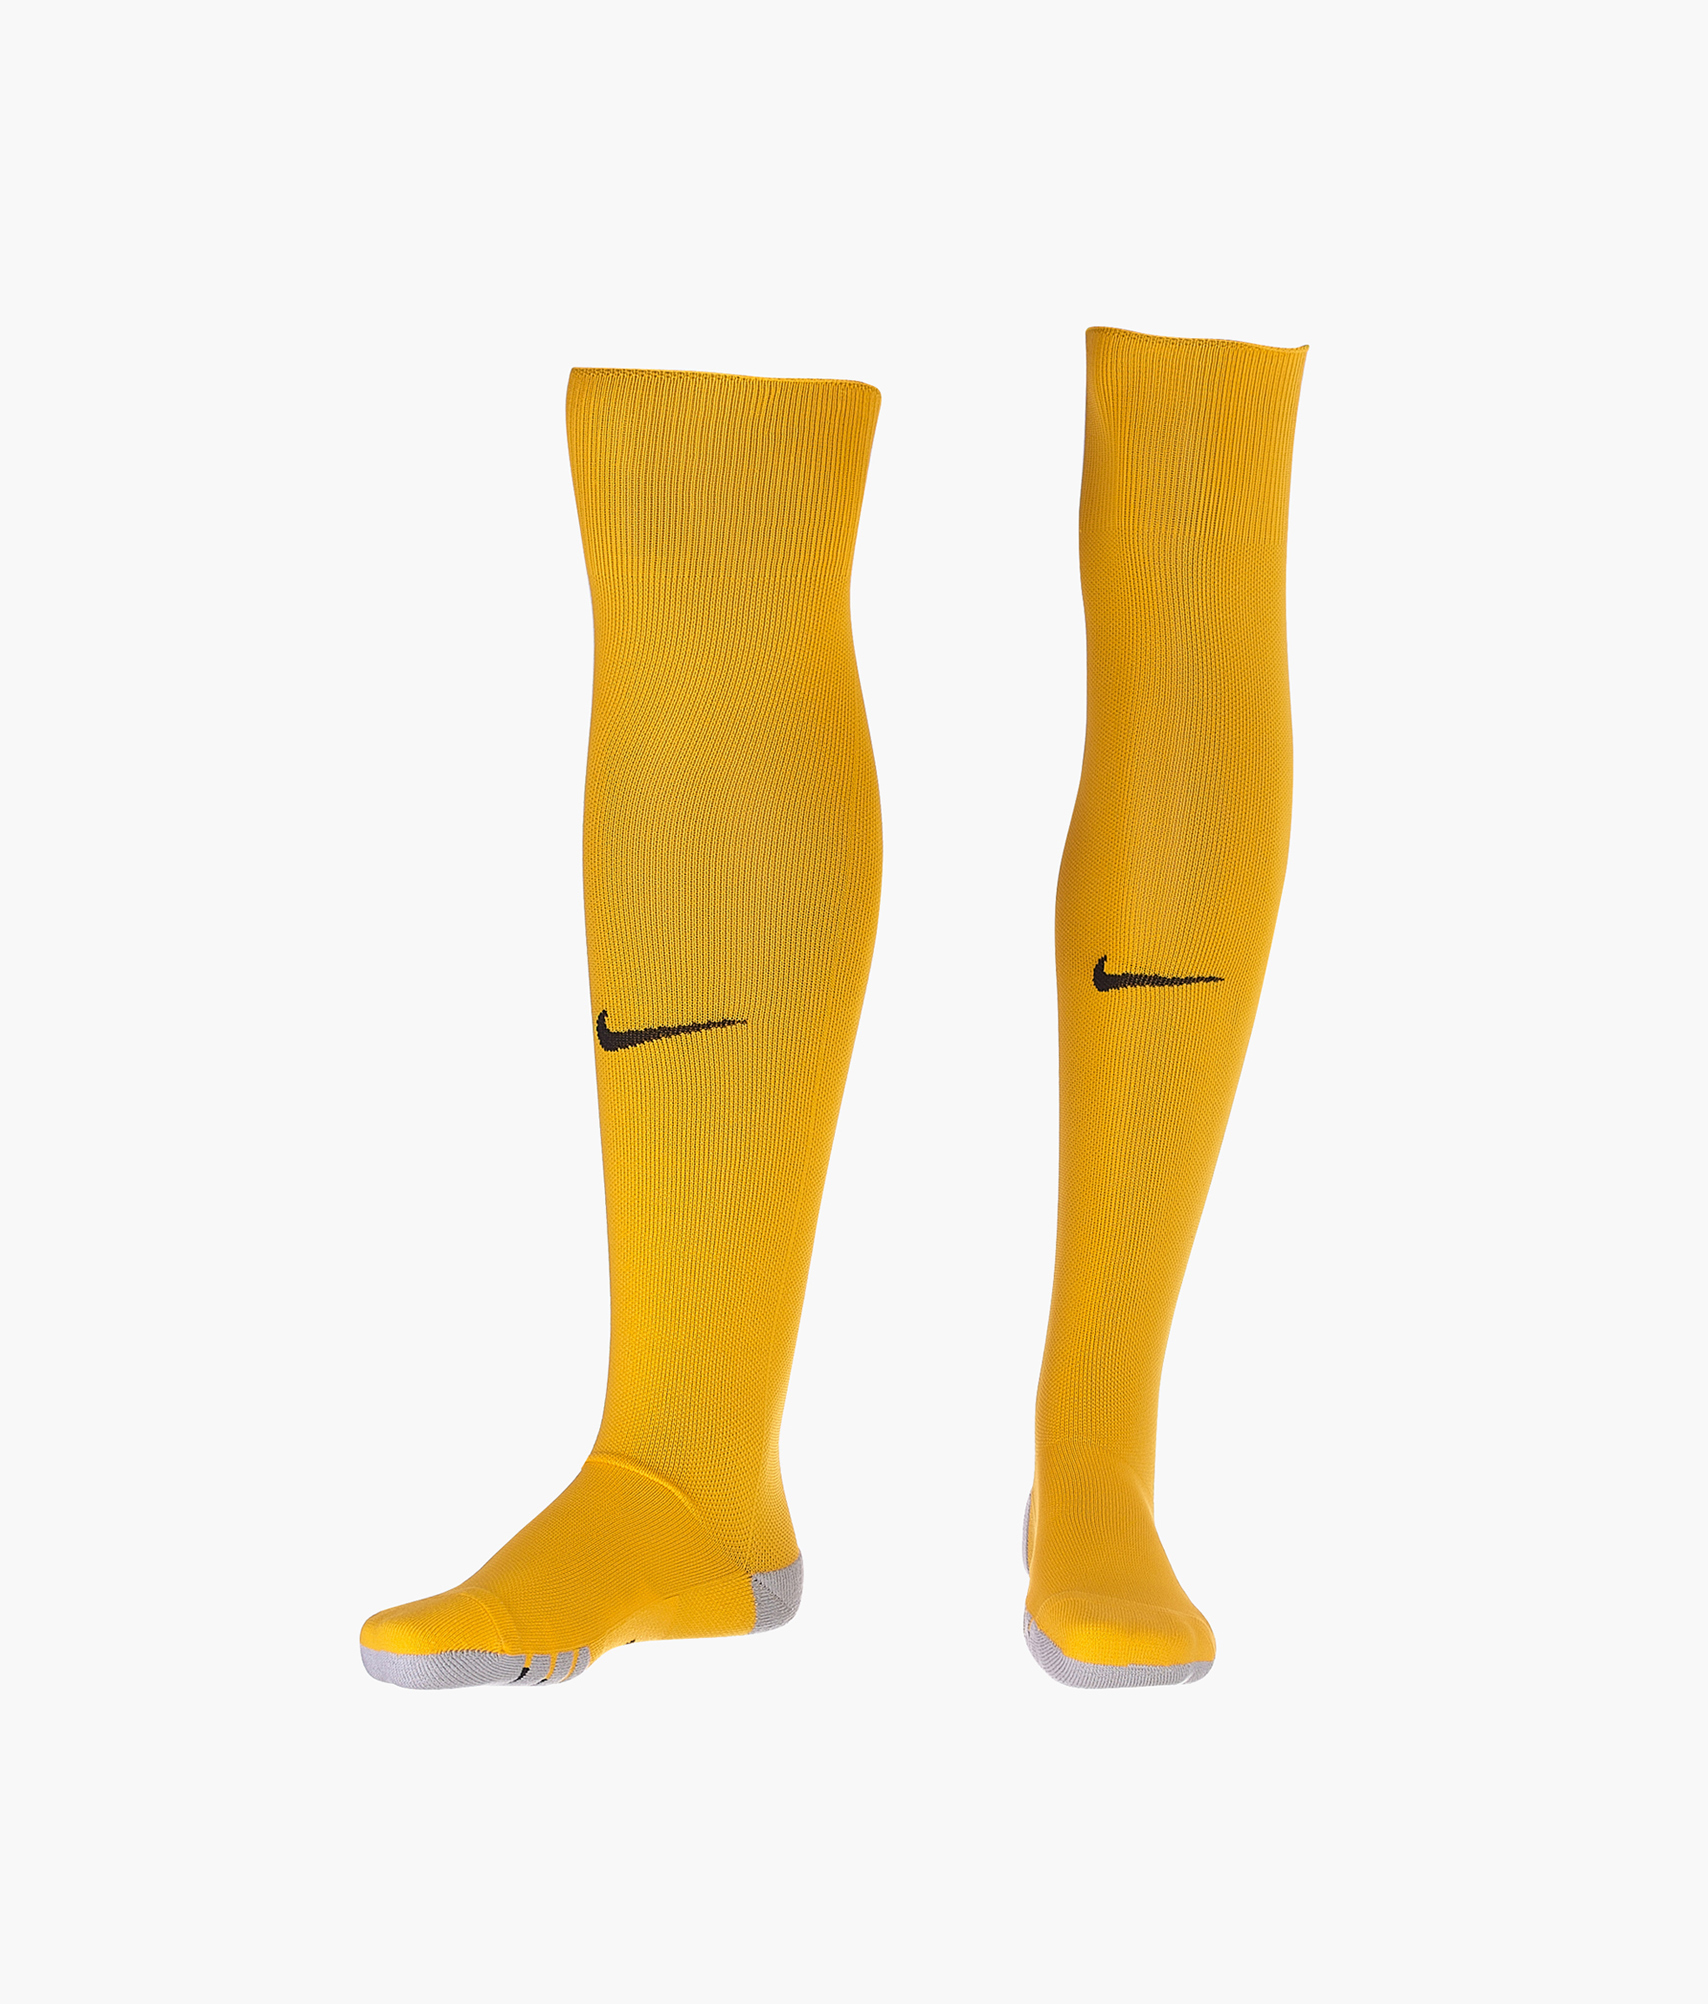 Гетры вратарские Nike сезона 2019/2020 Nike Цвет-Золотой гетры nike ts strirrup iii game sock 507819 739